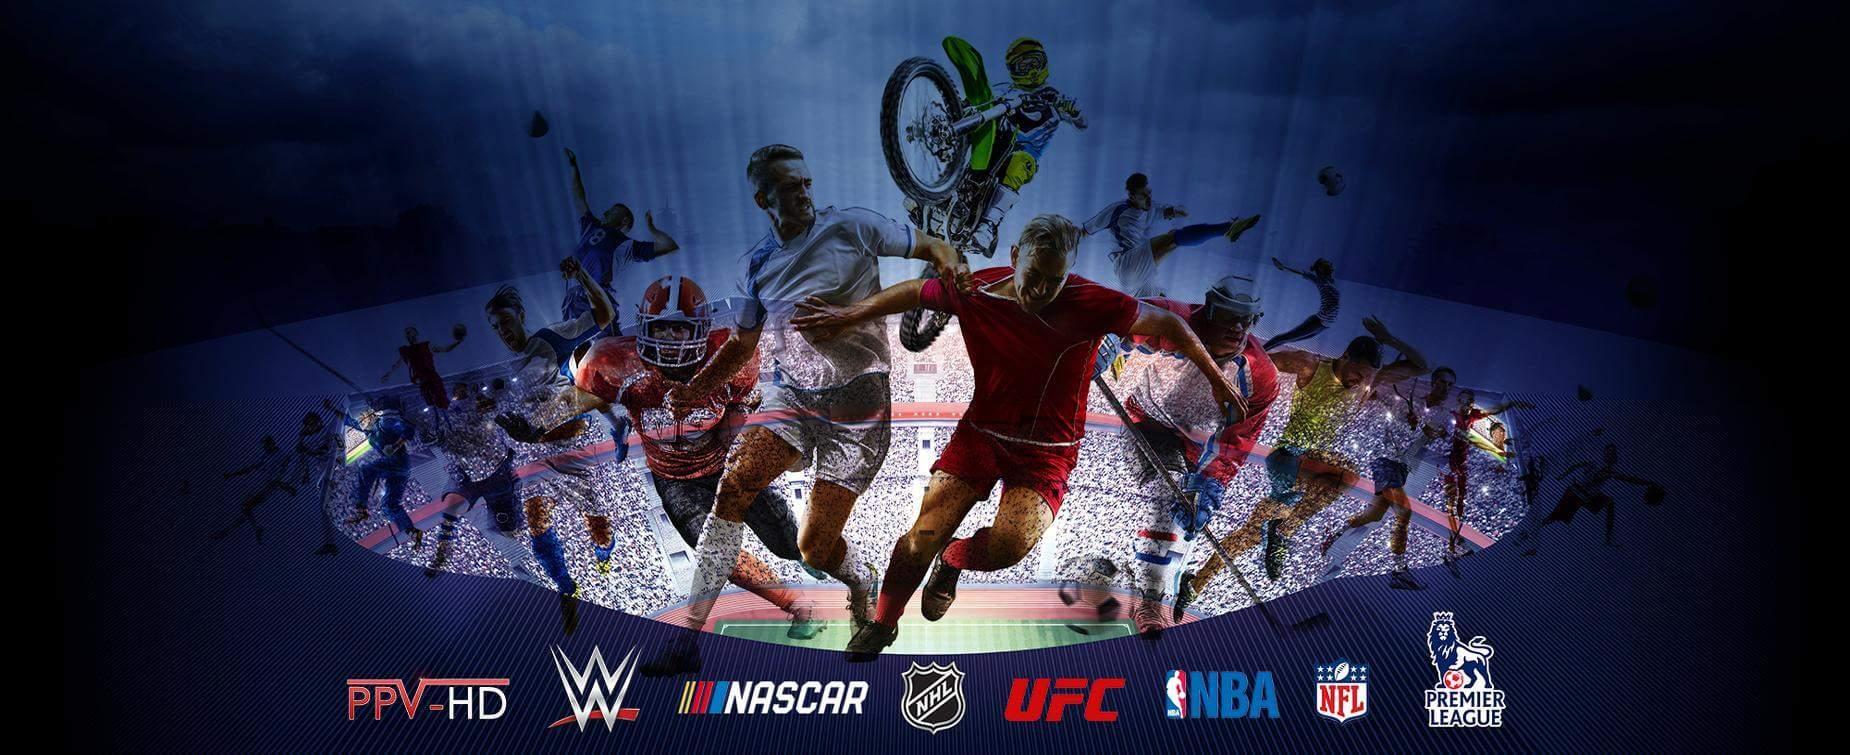 IPTV Subscription | The Best Reviews IPTV Service 2019